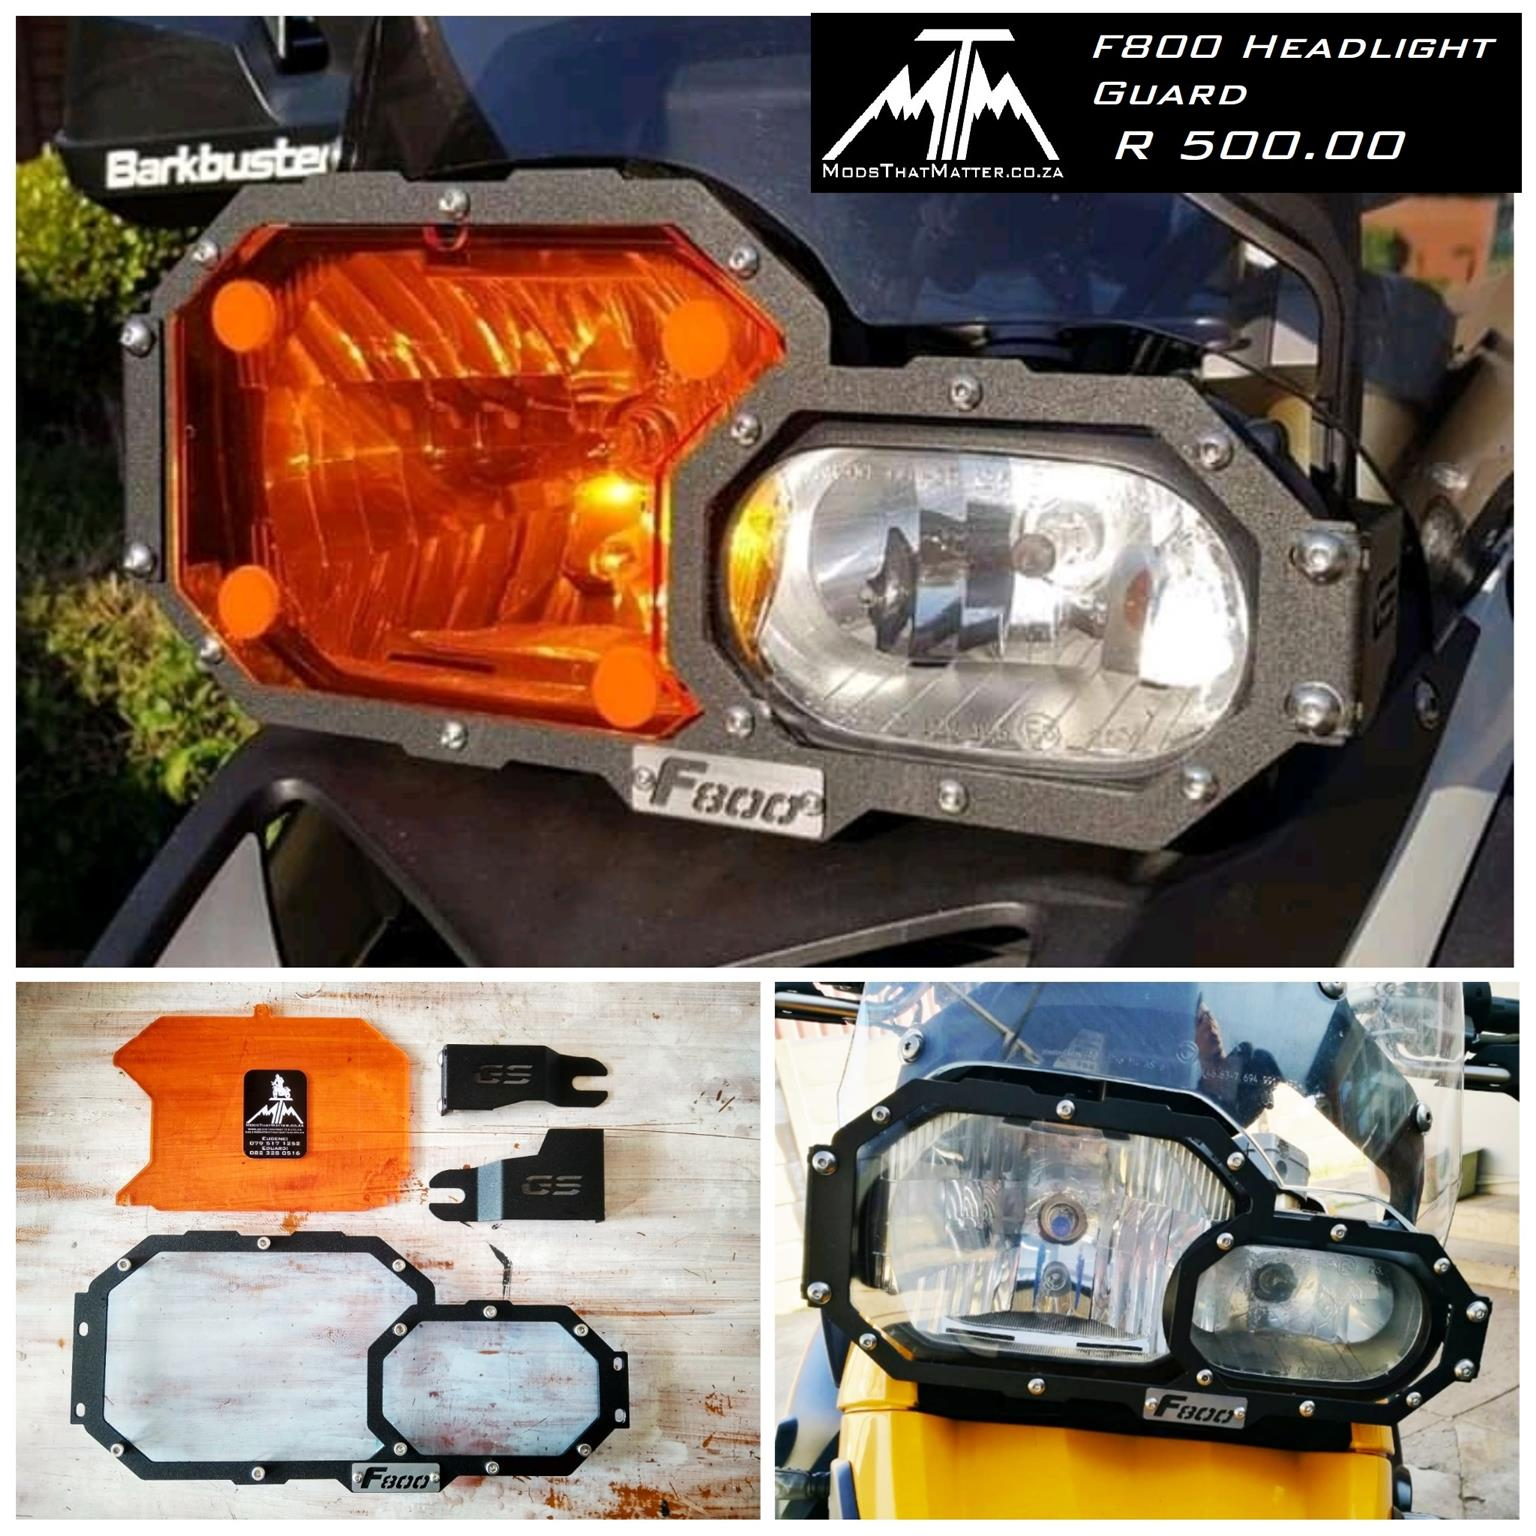 F800gs F700gs F650gs Headlight Protecors